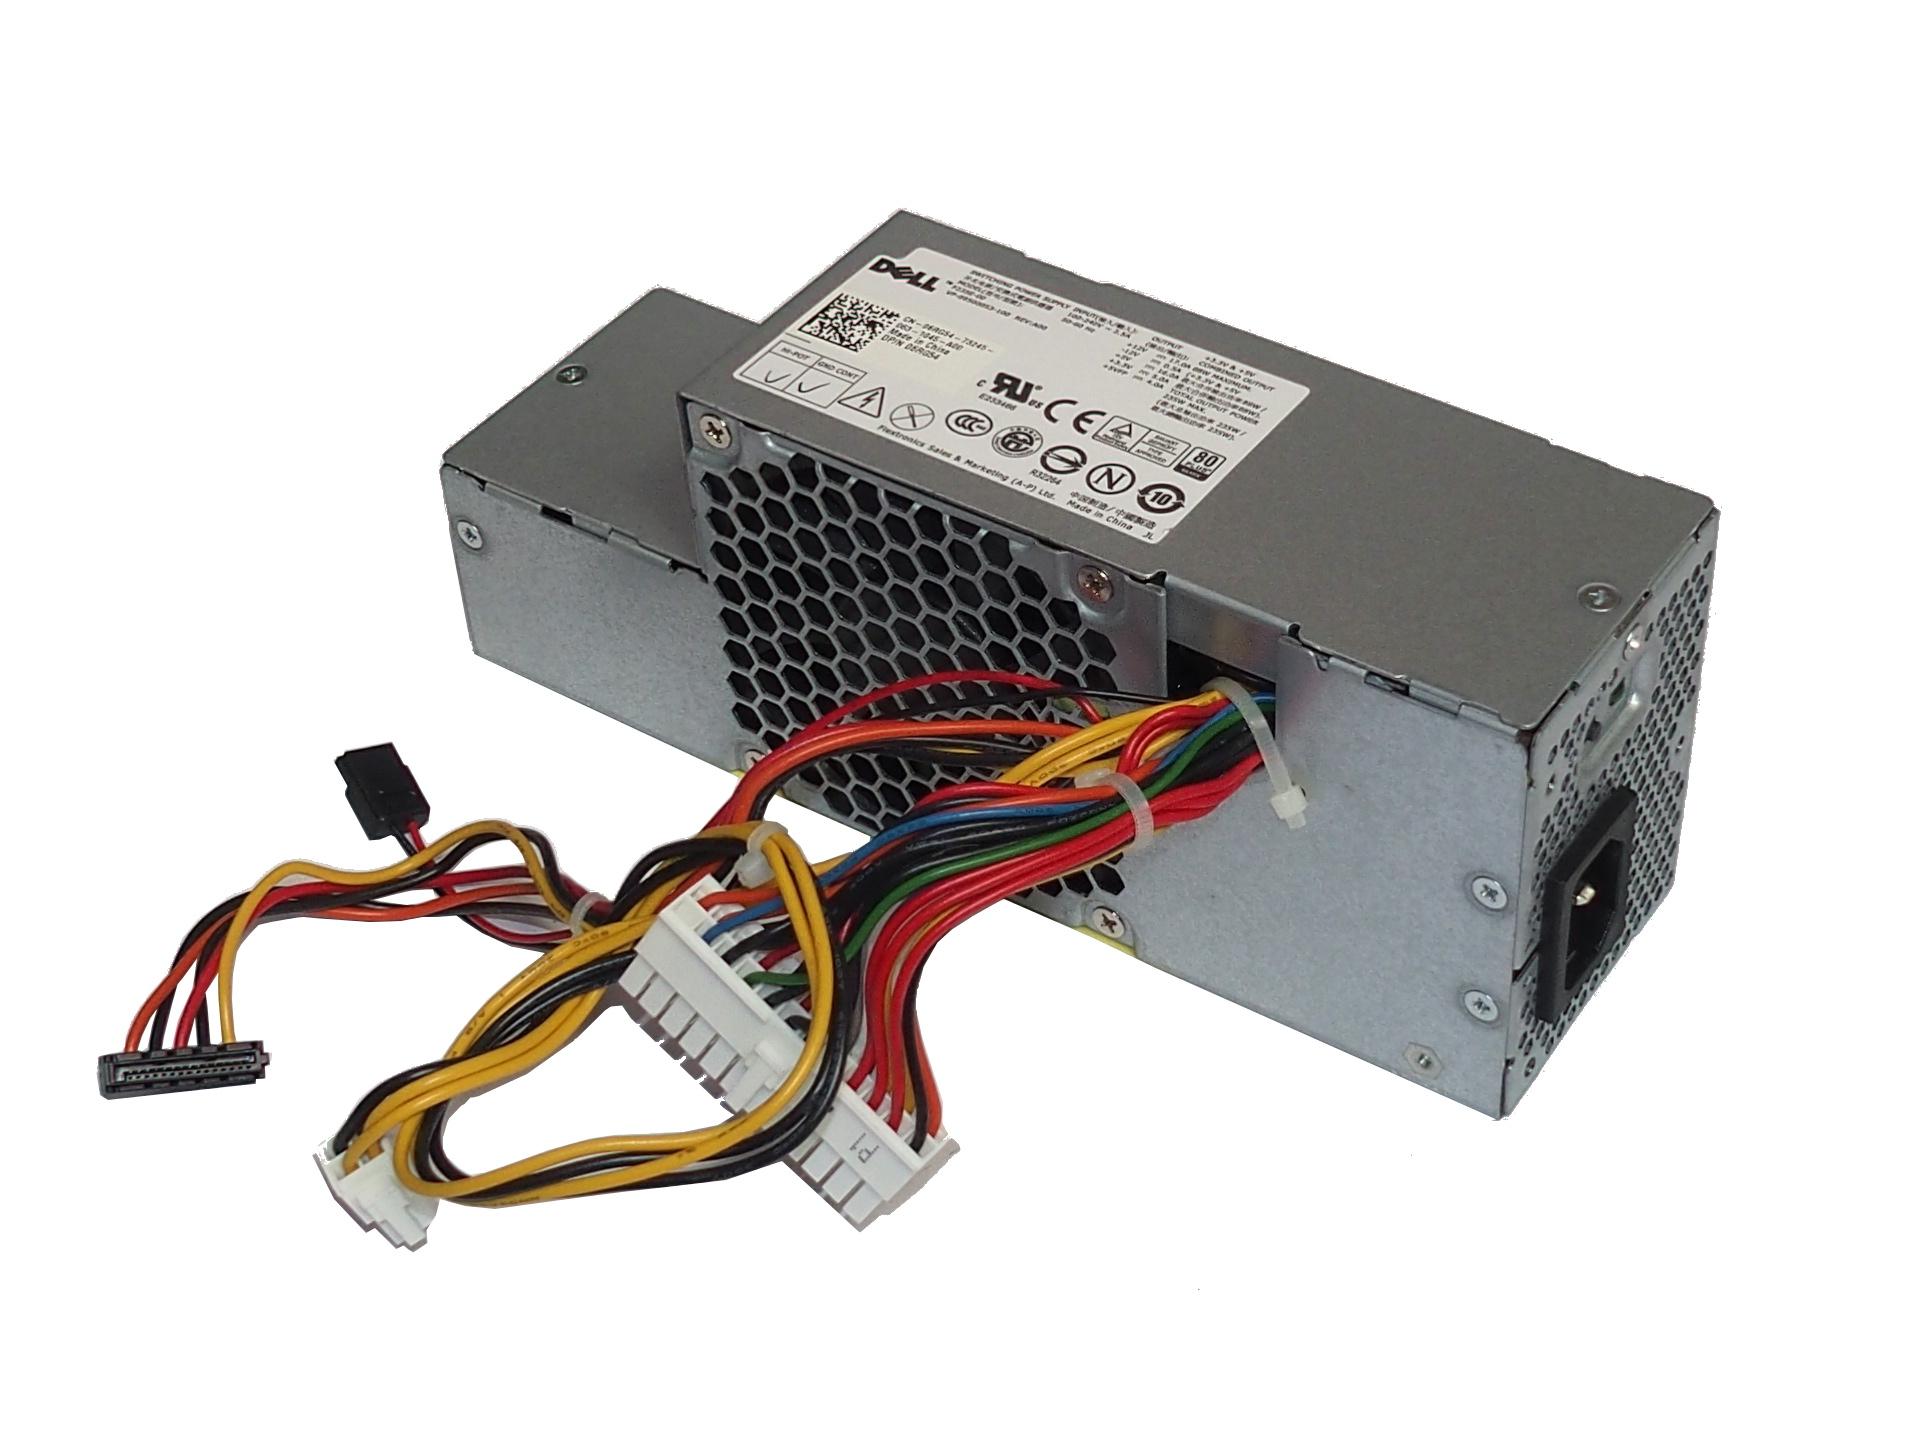 Dell 6RG54 Optiplex 380 SFF 235W Switching Power Supply